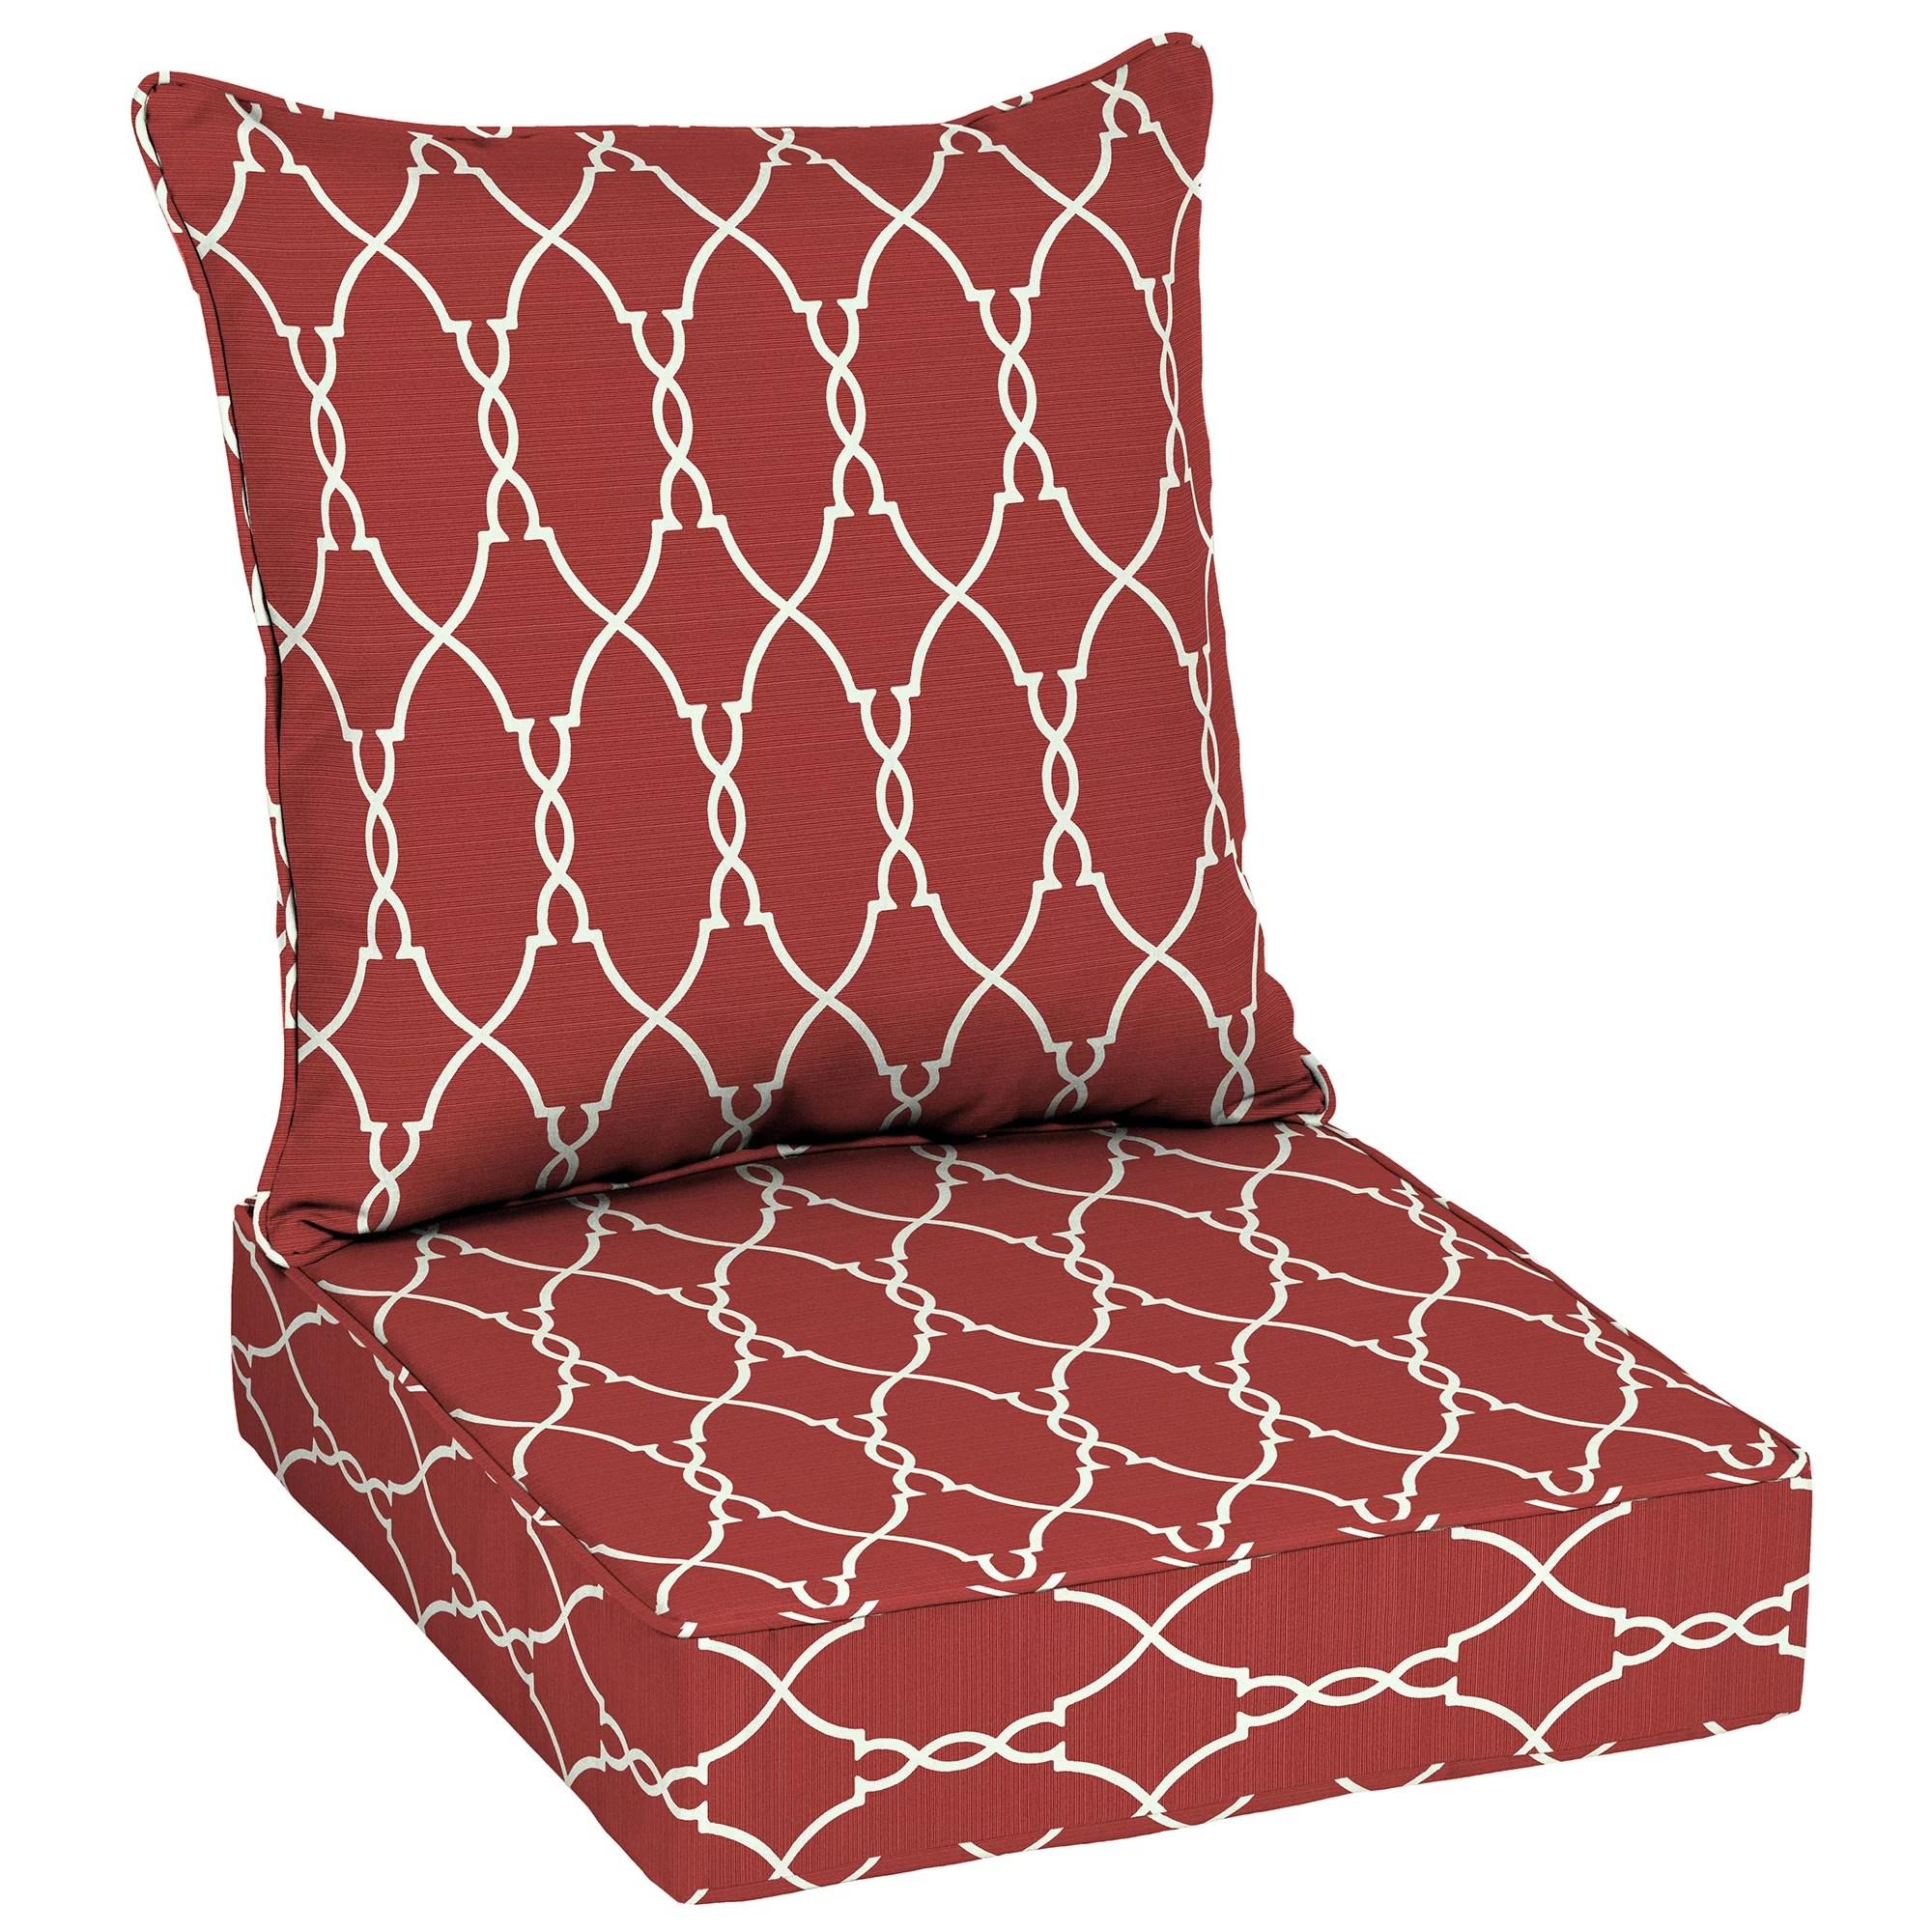 better homes gardens red trellis outdoor deep seat cushion set with enviroguard 48 l x 24 w x 5 75 h walmart com